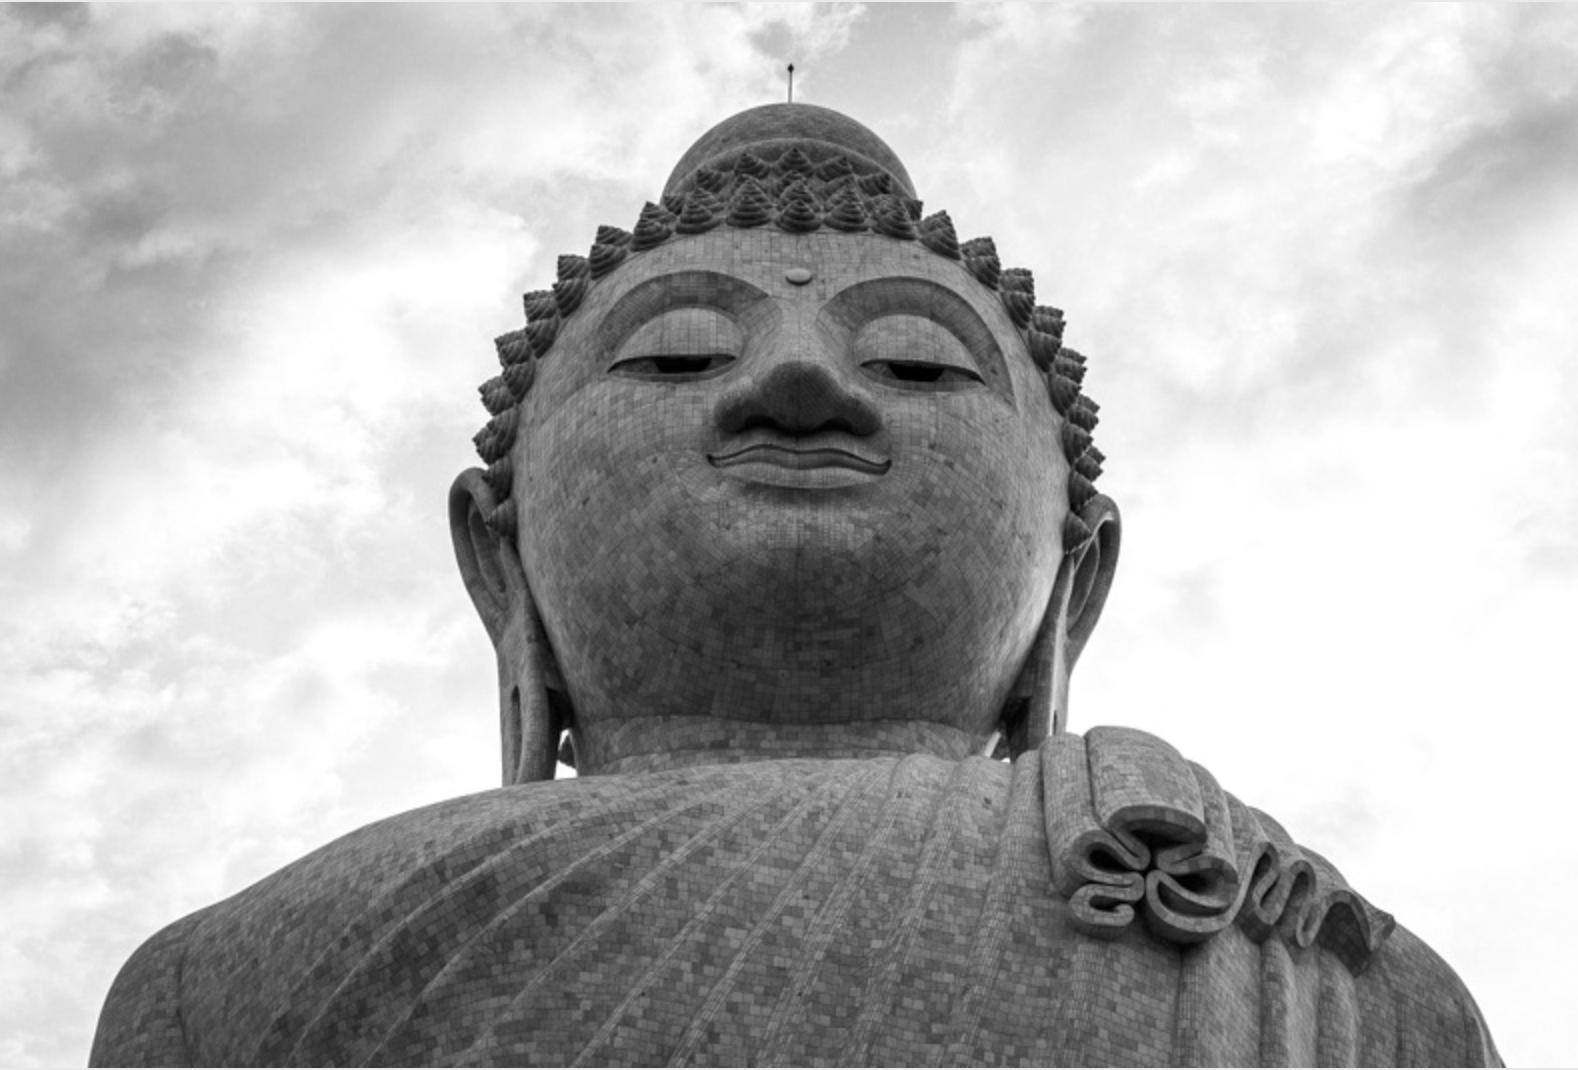 Face of PHRA PUTTAMINGMONGKOL AKENAKKIRI BUDDHA